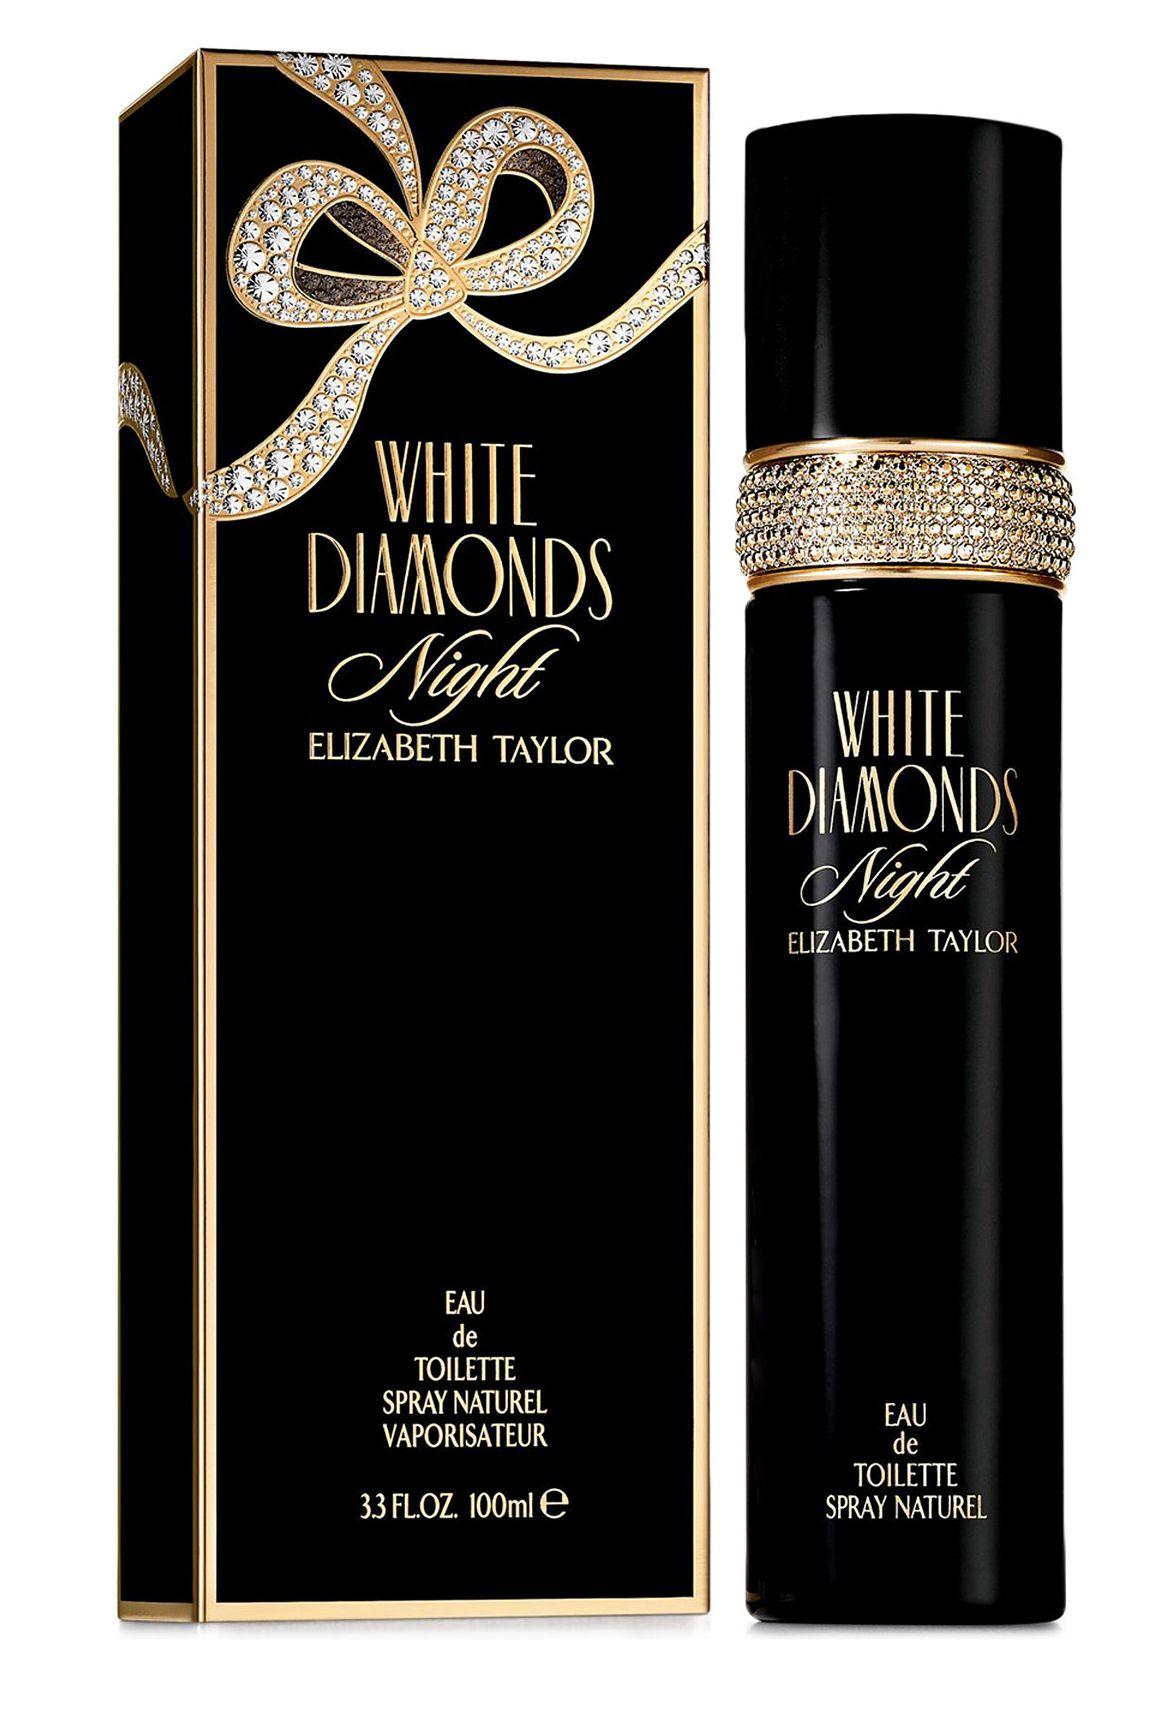 Elizabeth Taylor White Diamonds Night New Fragrances